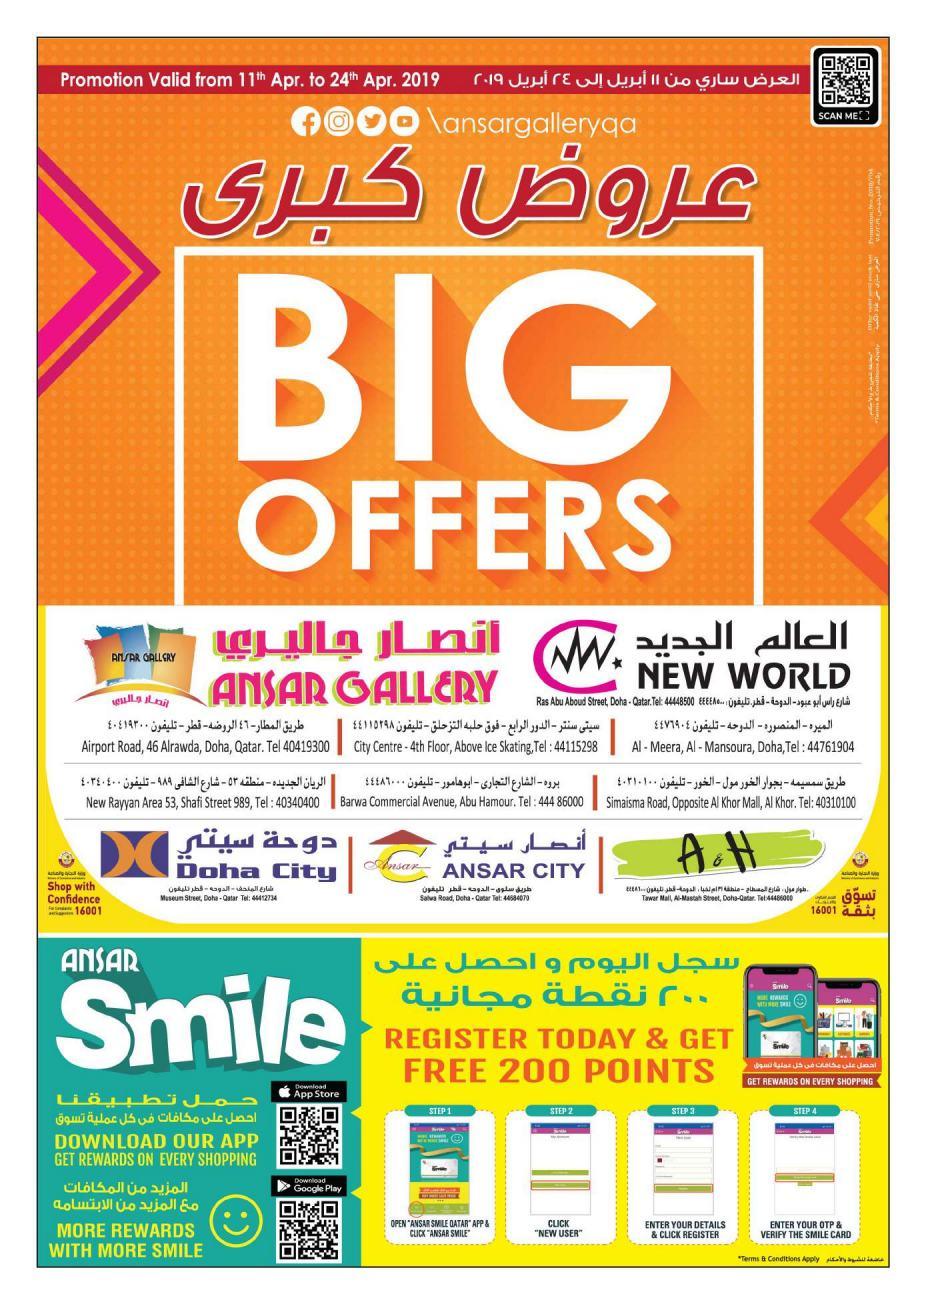 Ansar Gallery Big Offers